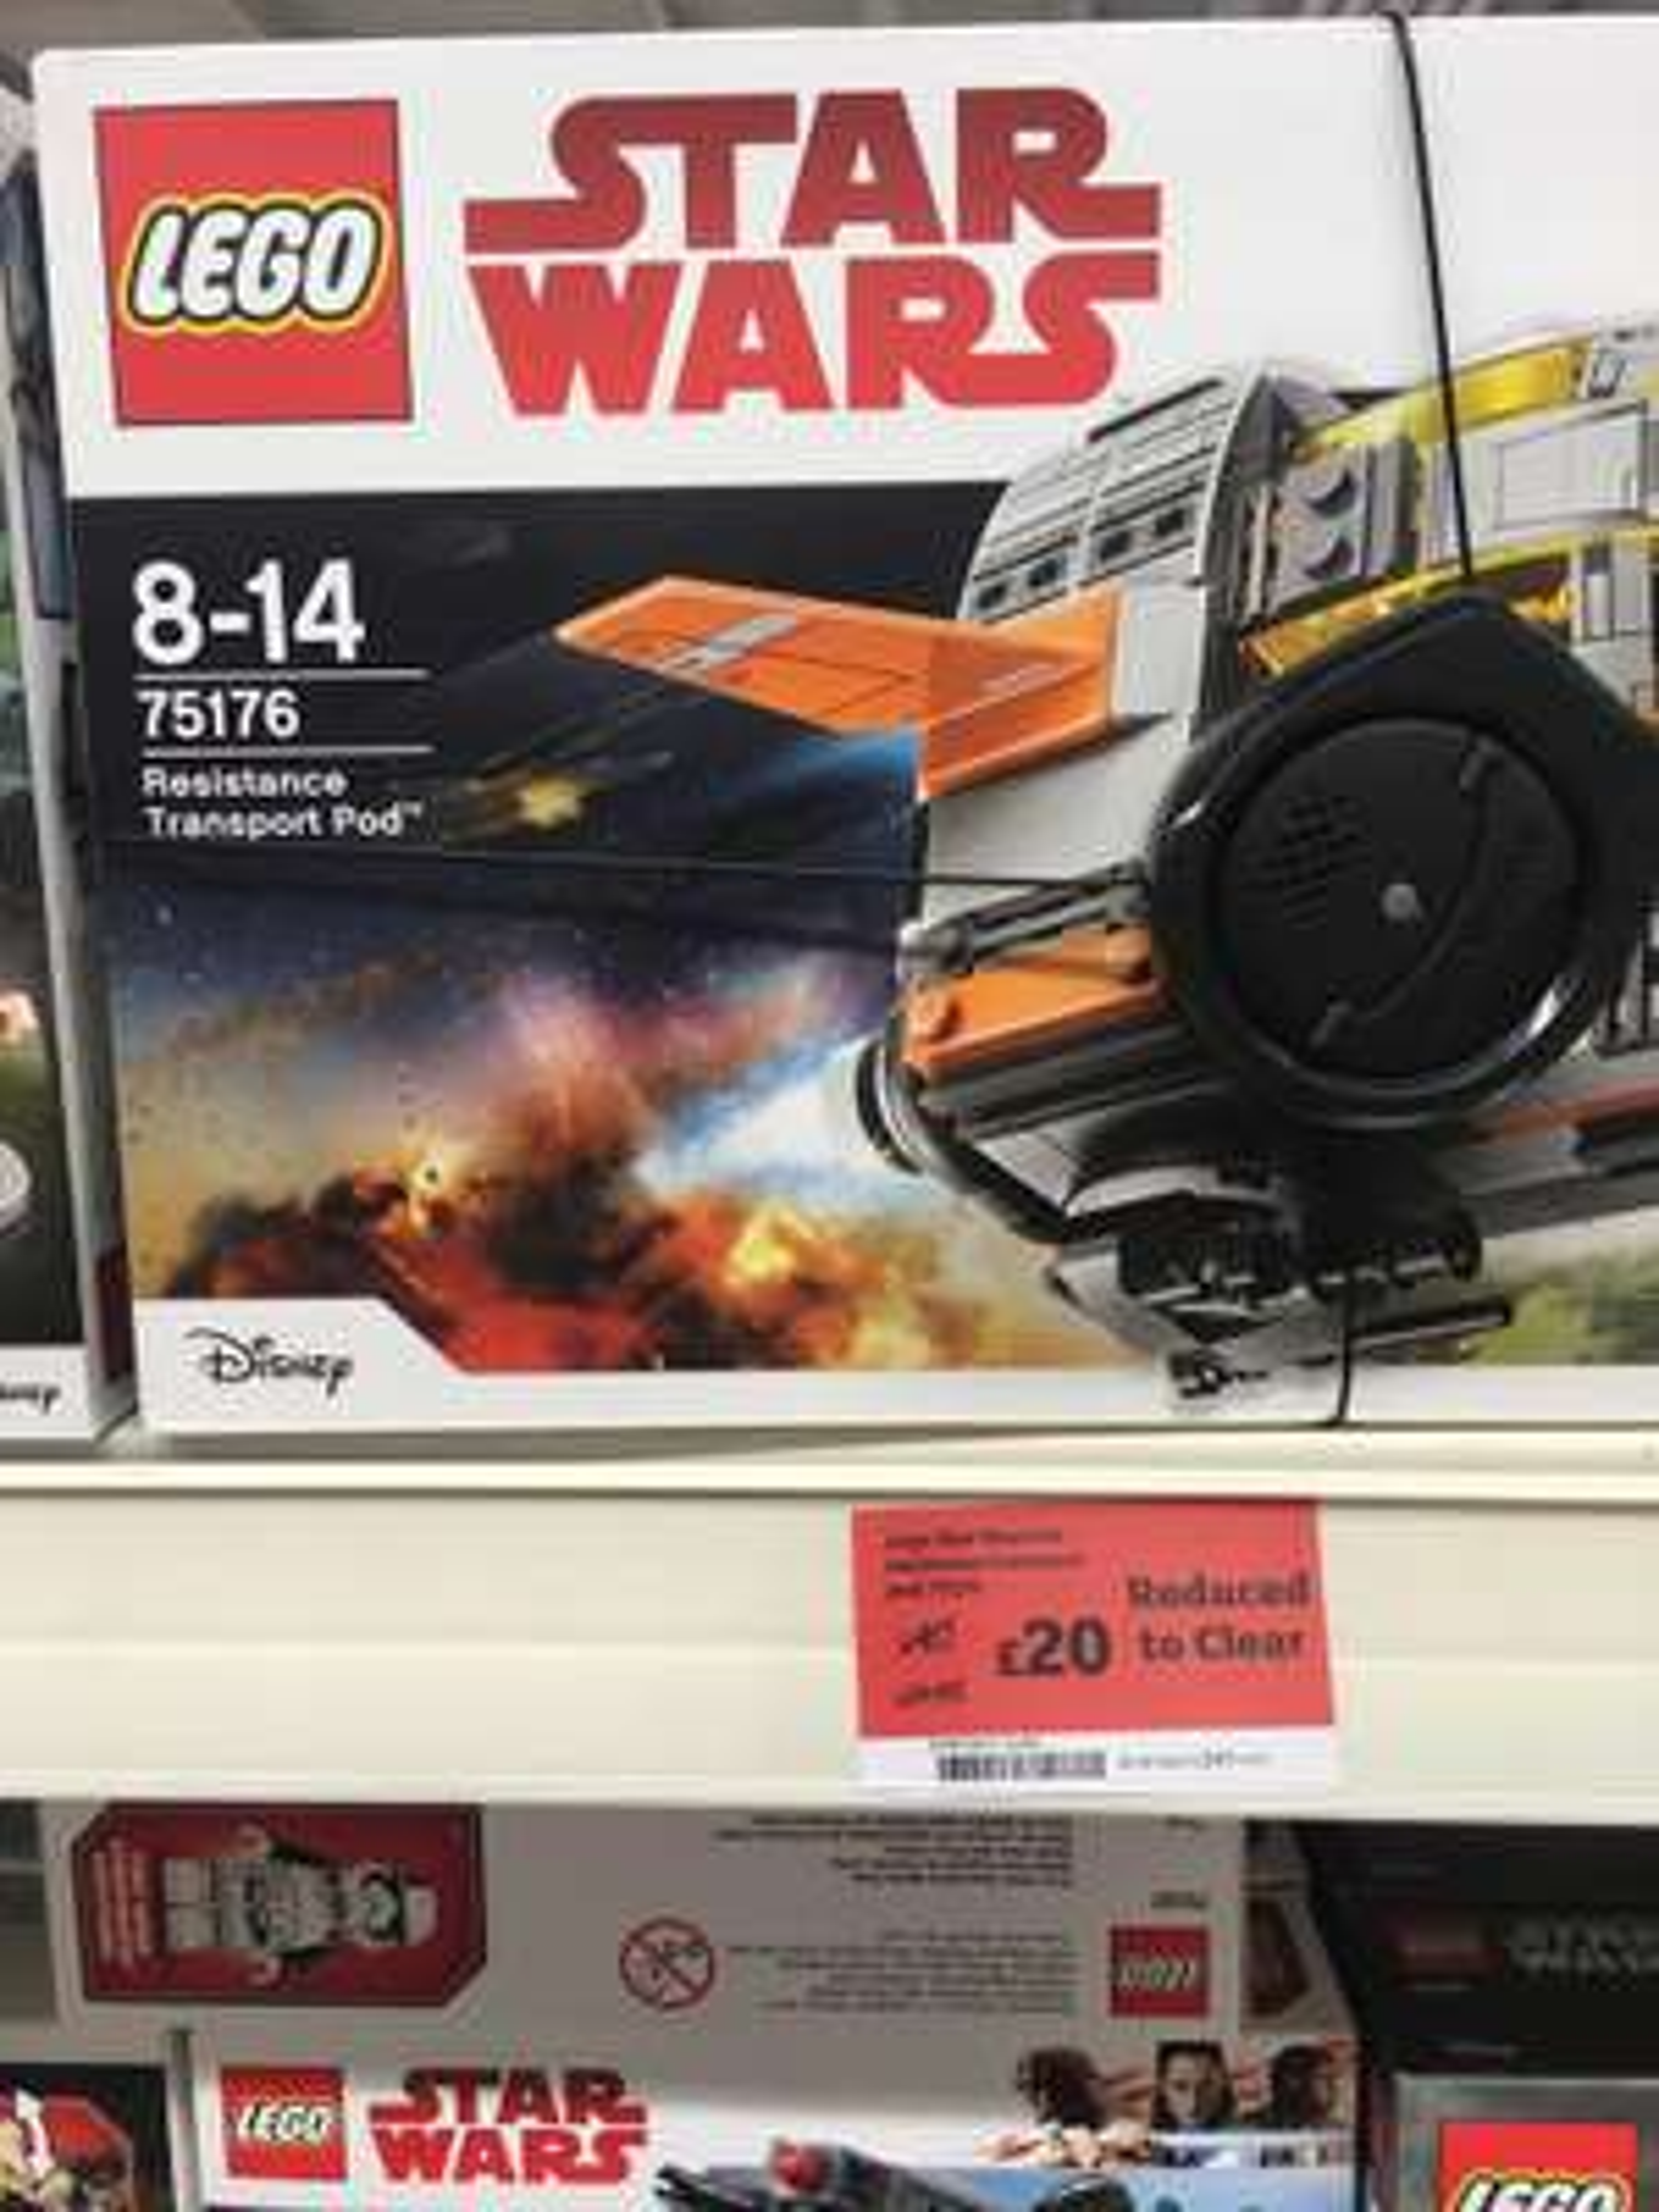 LEGO 75176 Star Wars resistance transport pod – £20 instore @ Sainsbury's